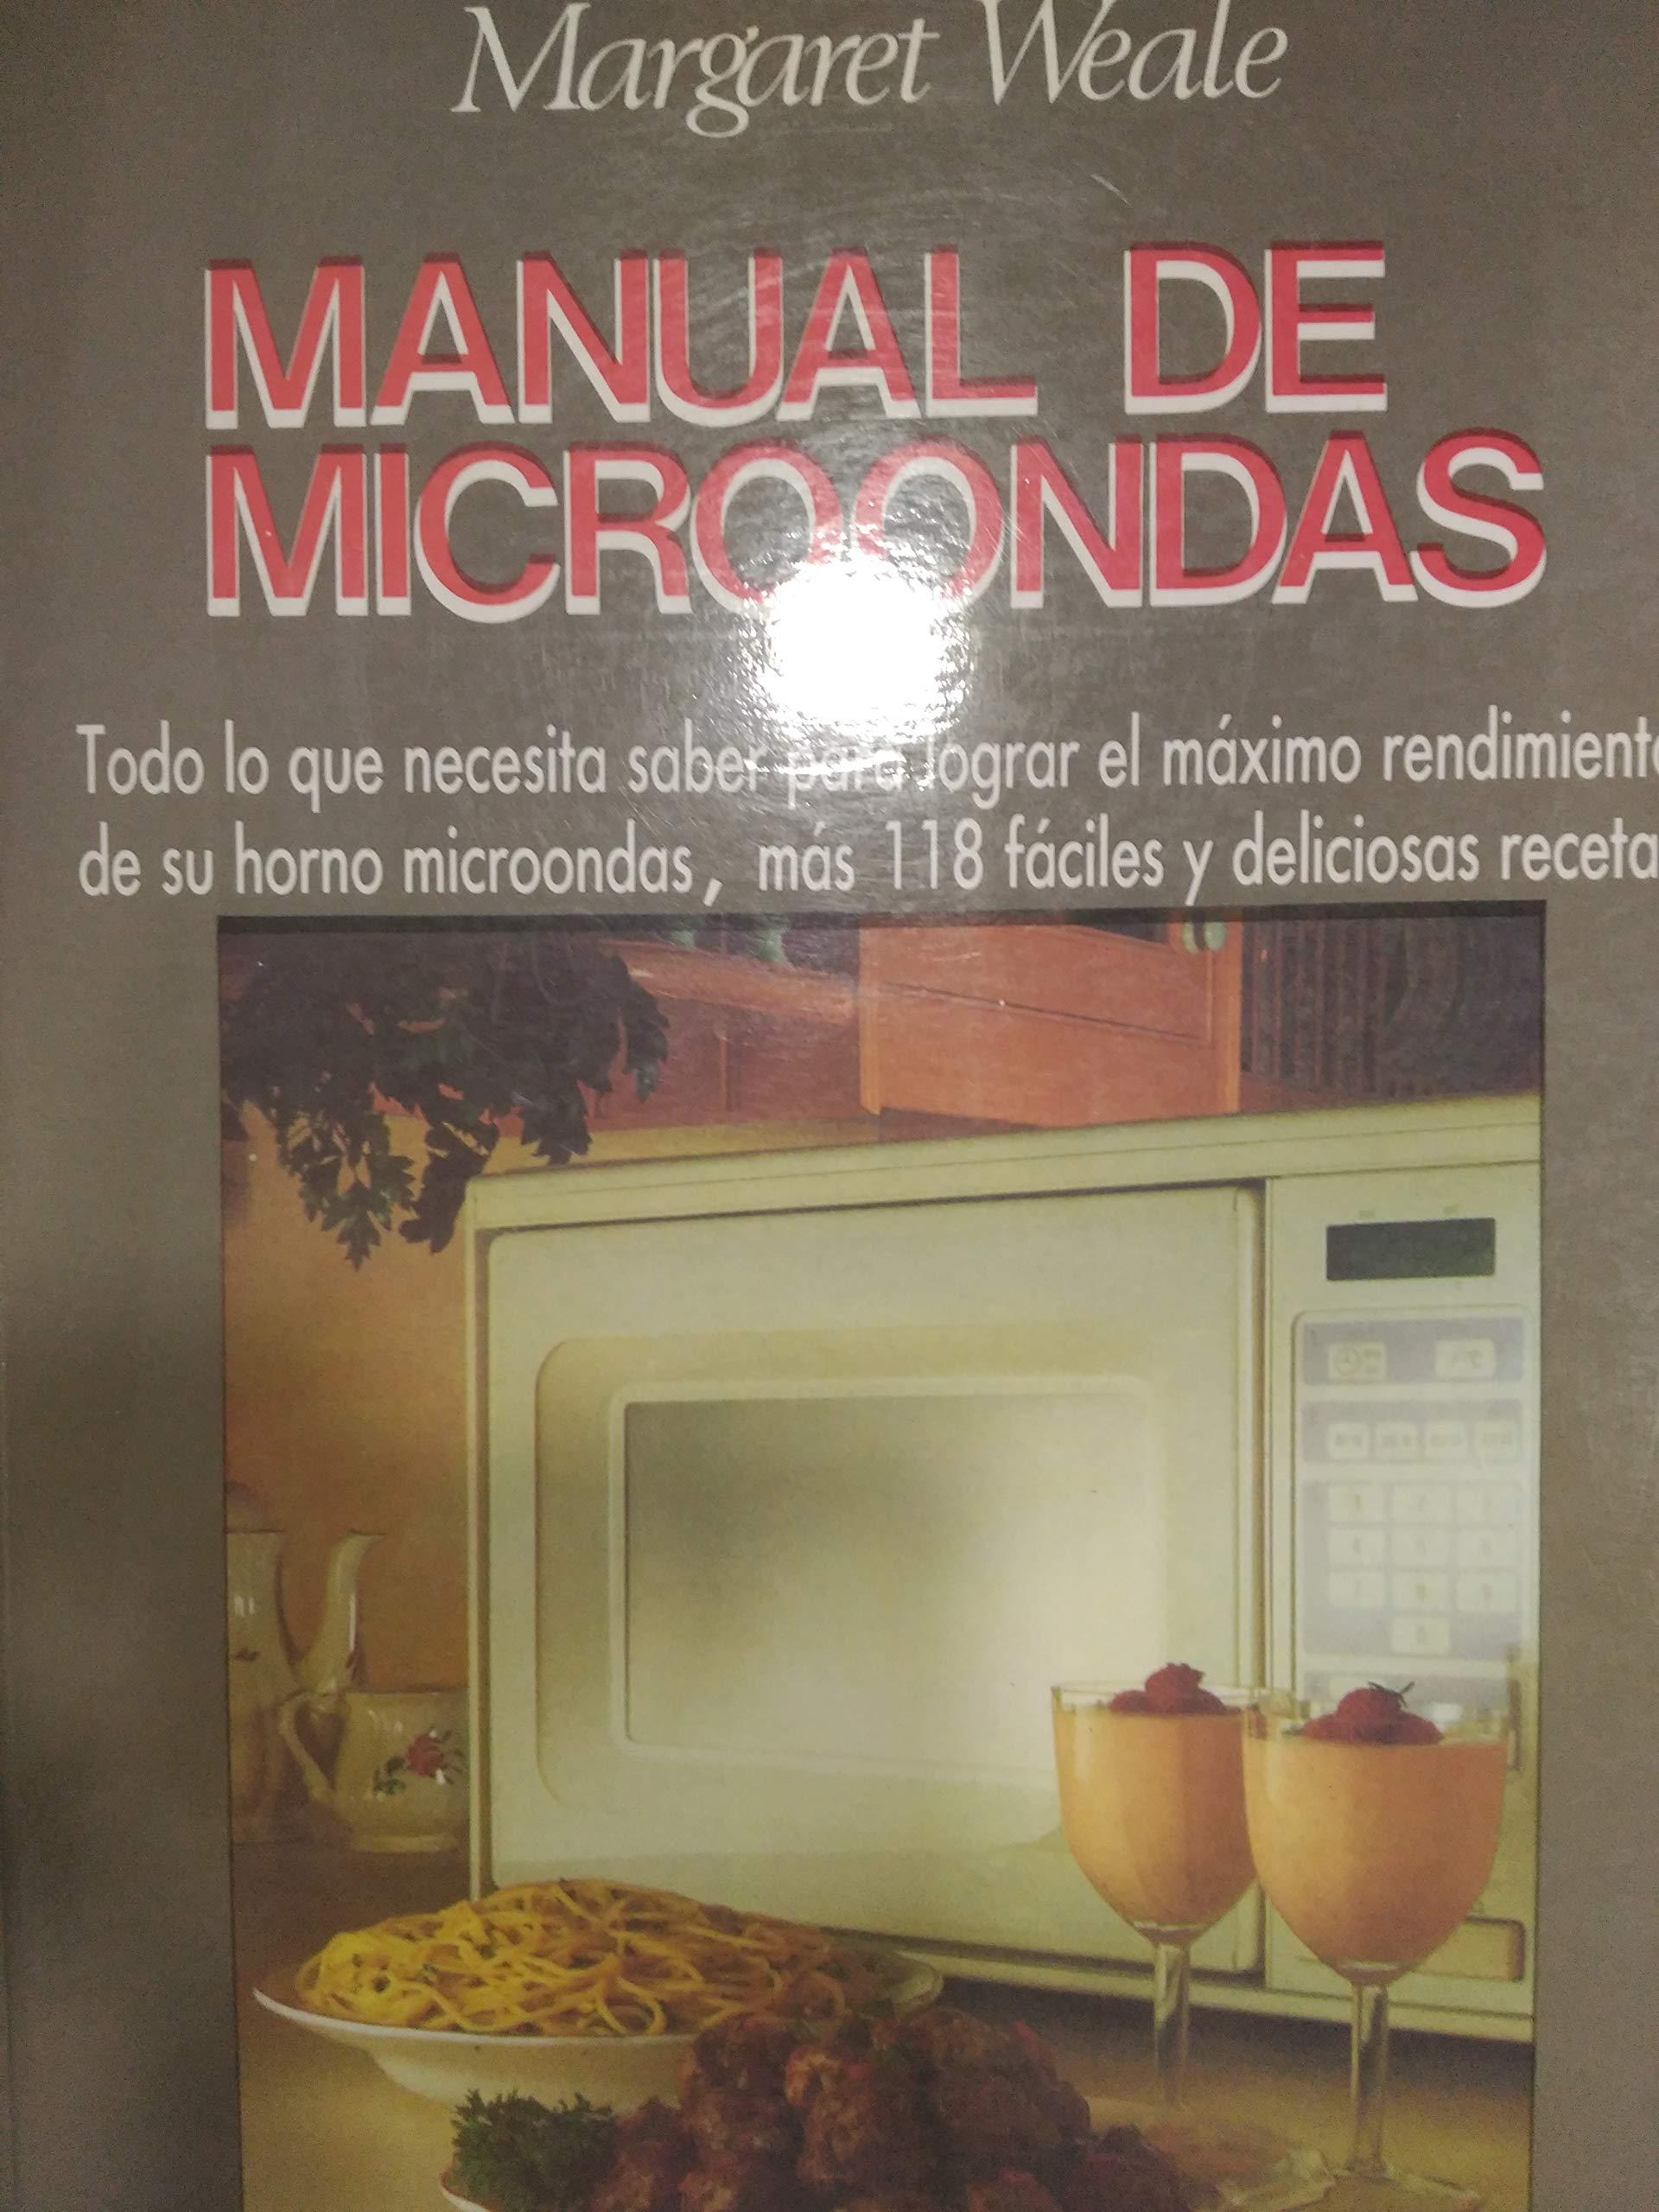 Manual de microondas: 9788470024016: Amazon.com: Books